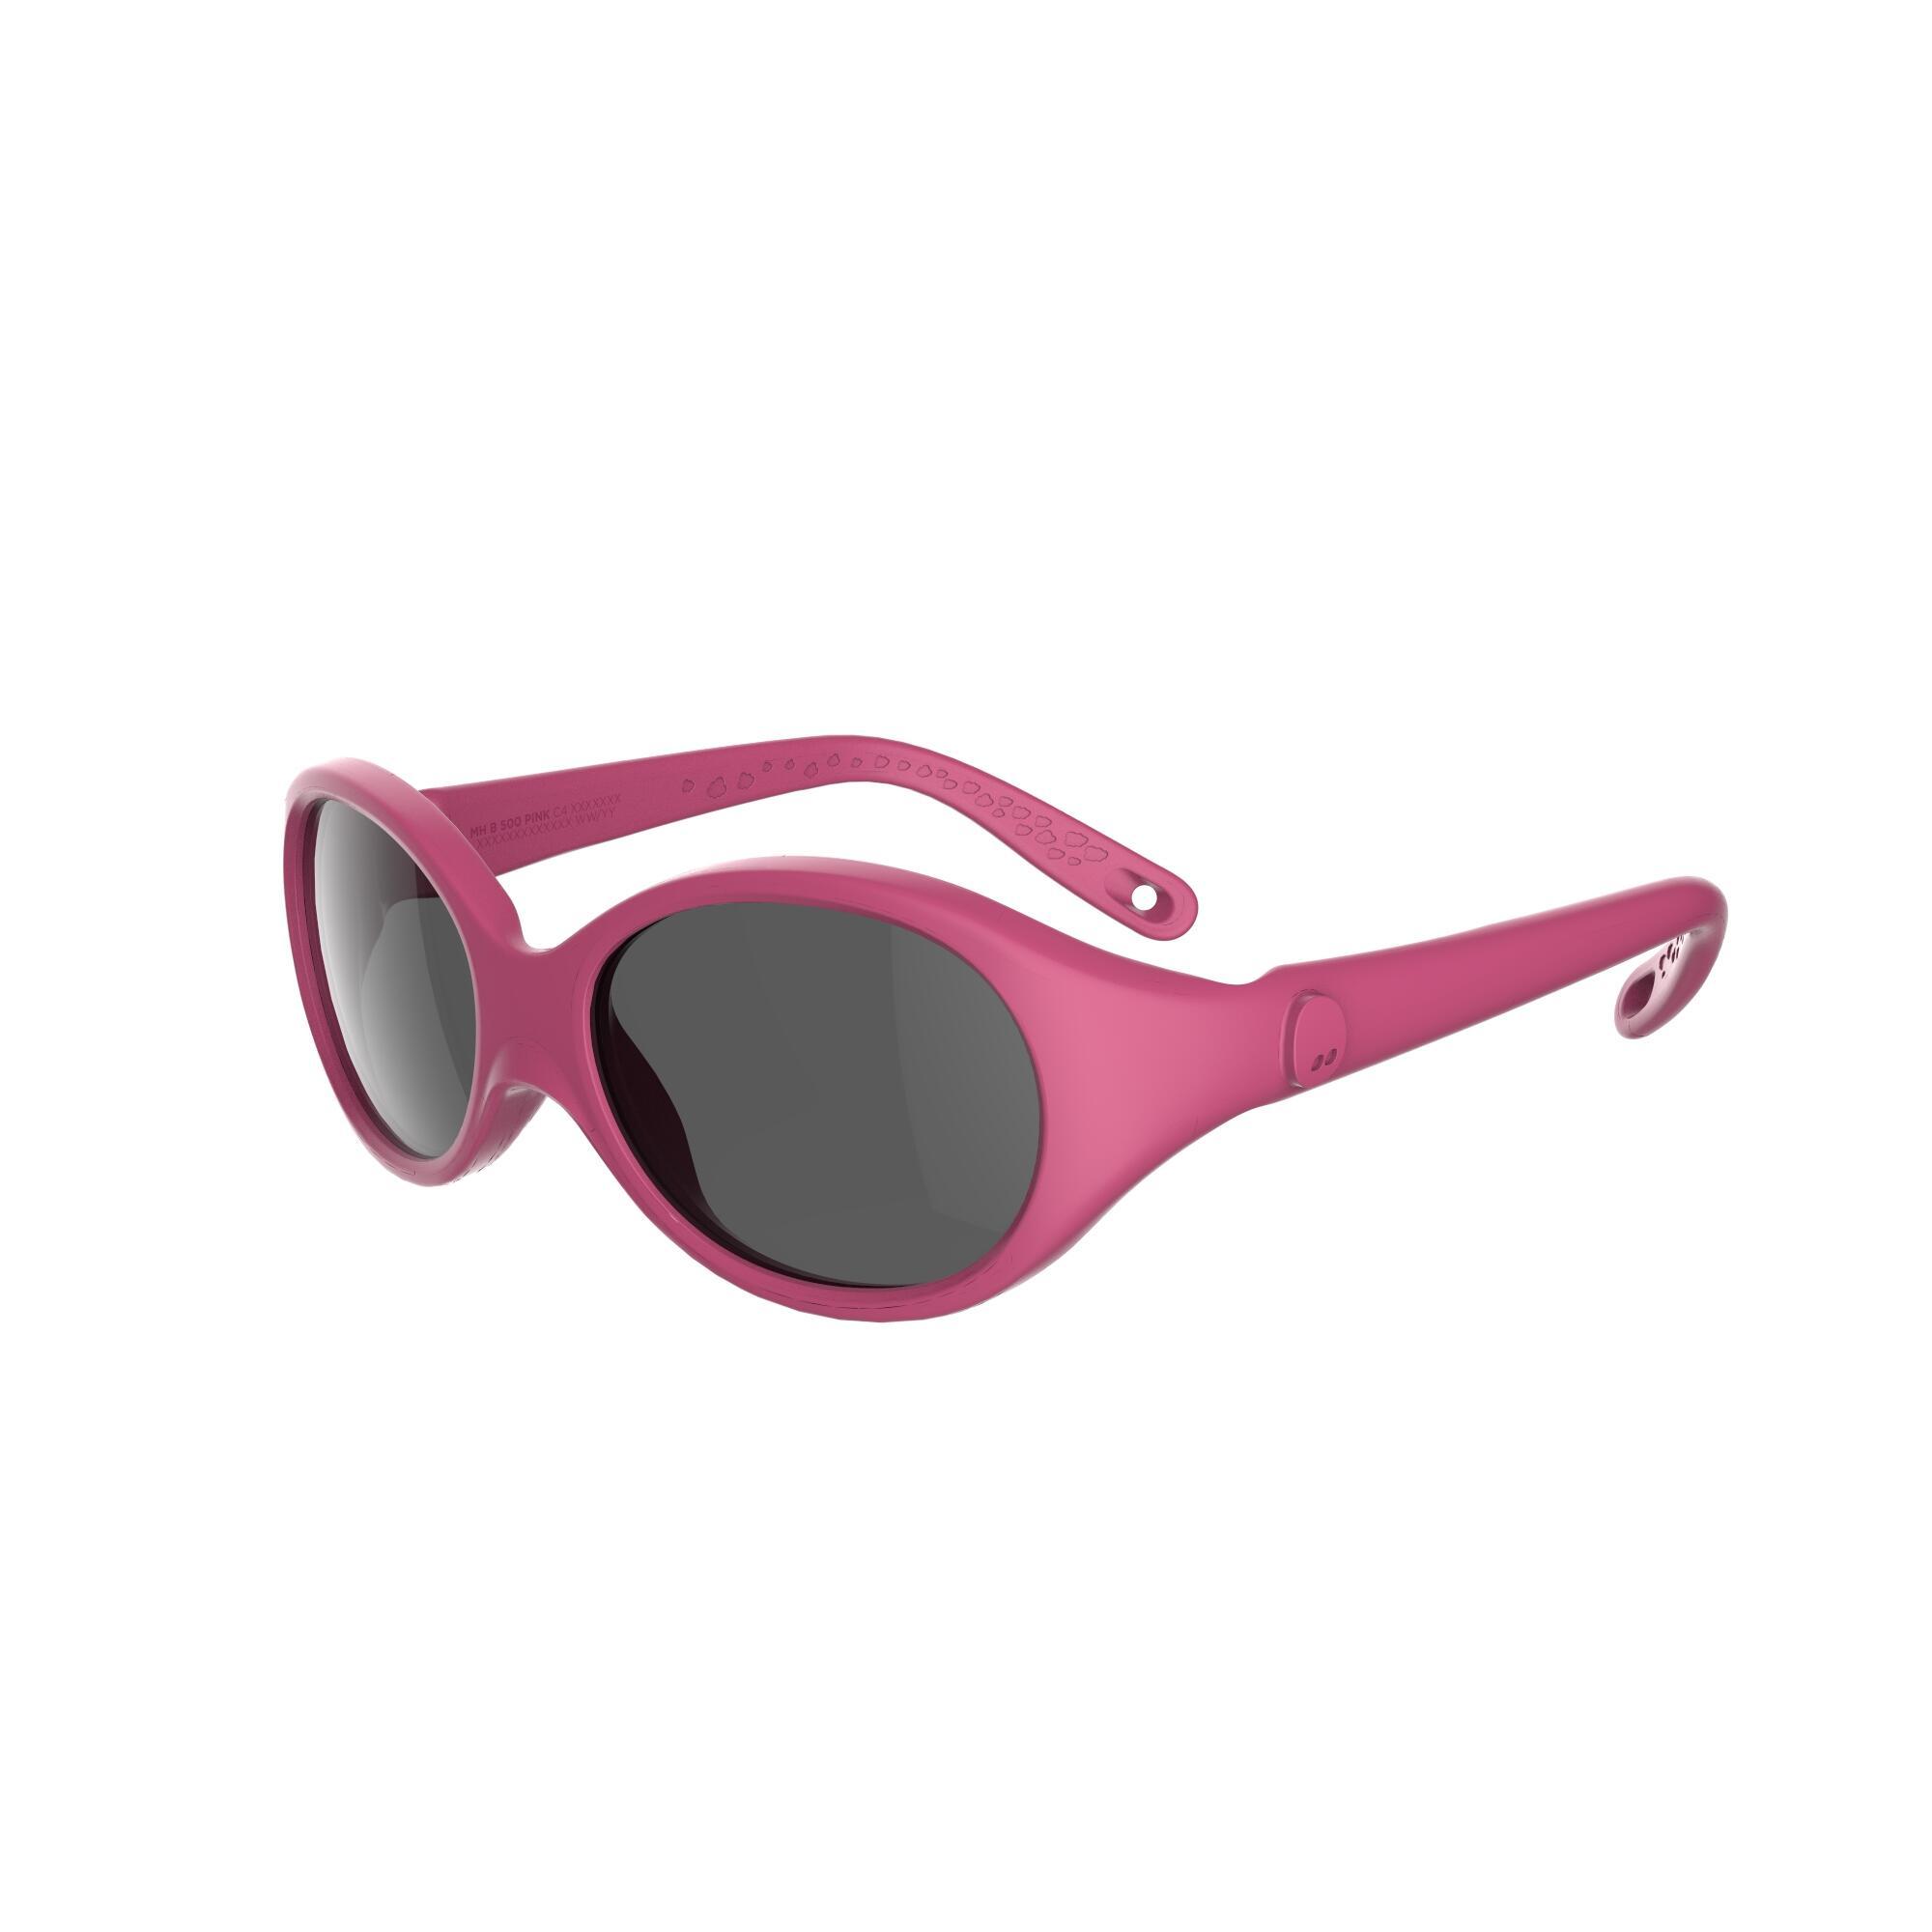 Lentes de sol de senderismo bebé 6 - 24 meses MH B 500 rosa categoría 4